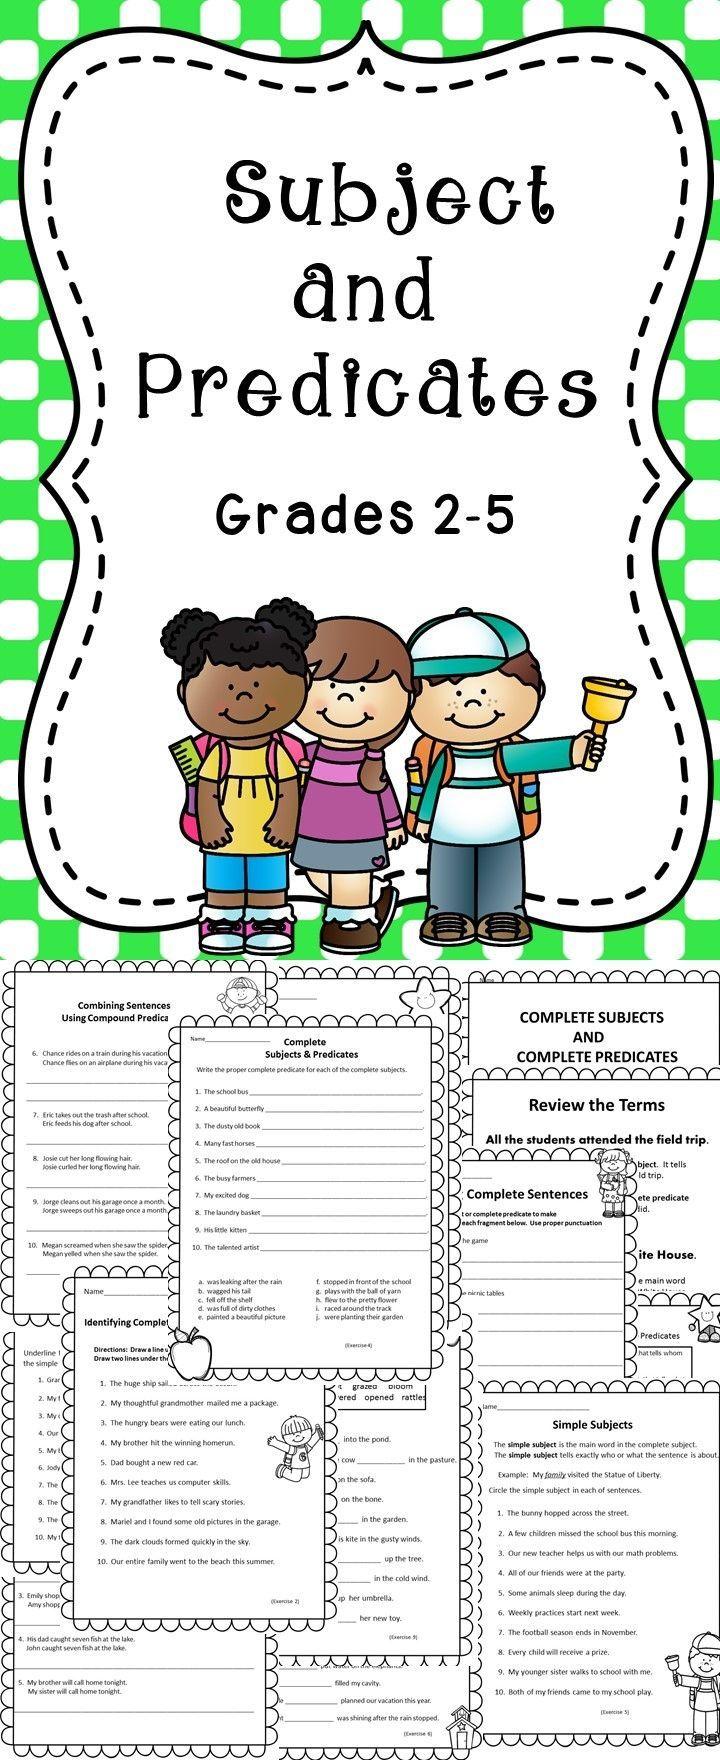 Subjects and Predicates Subject, predicate, Teaching